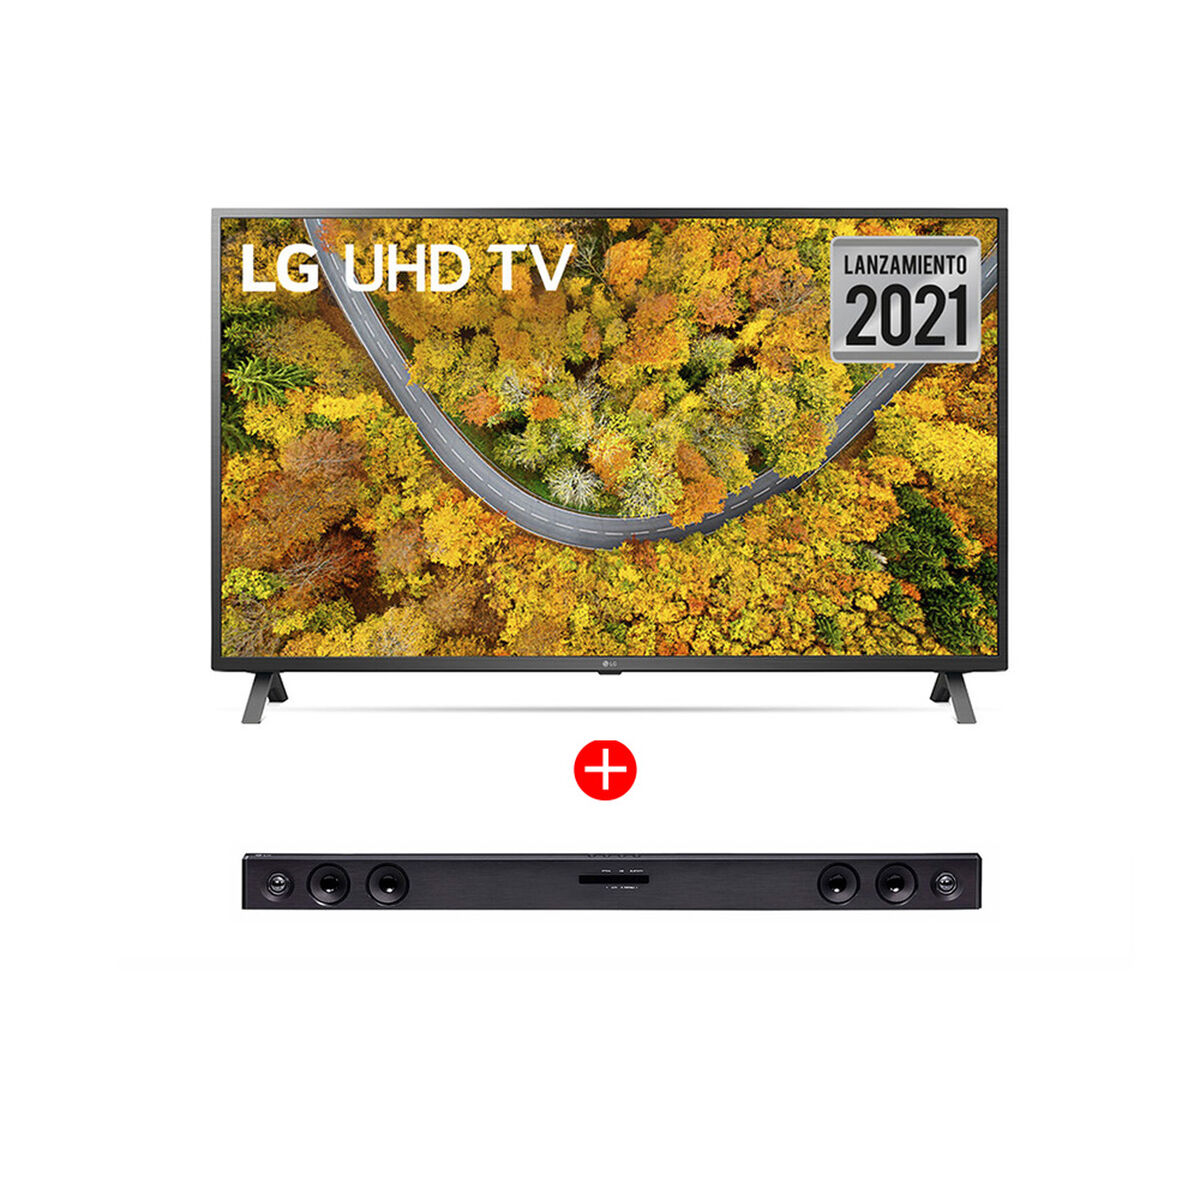 "Combo LED 55"" LG 55UP7500PSF Smart TV 4K UHD 2021  + Soundbar SK1D"